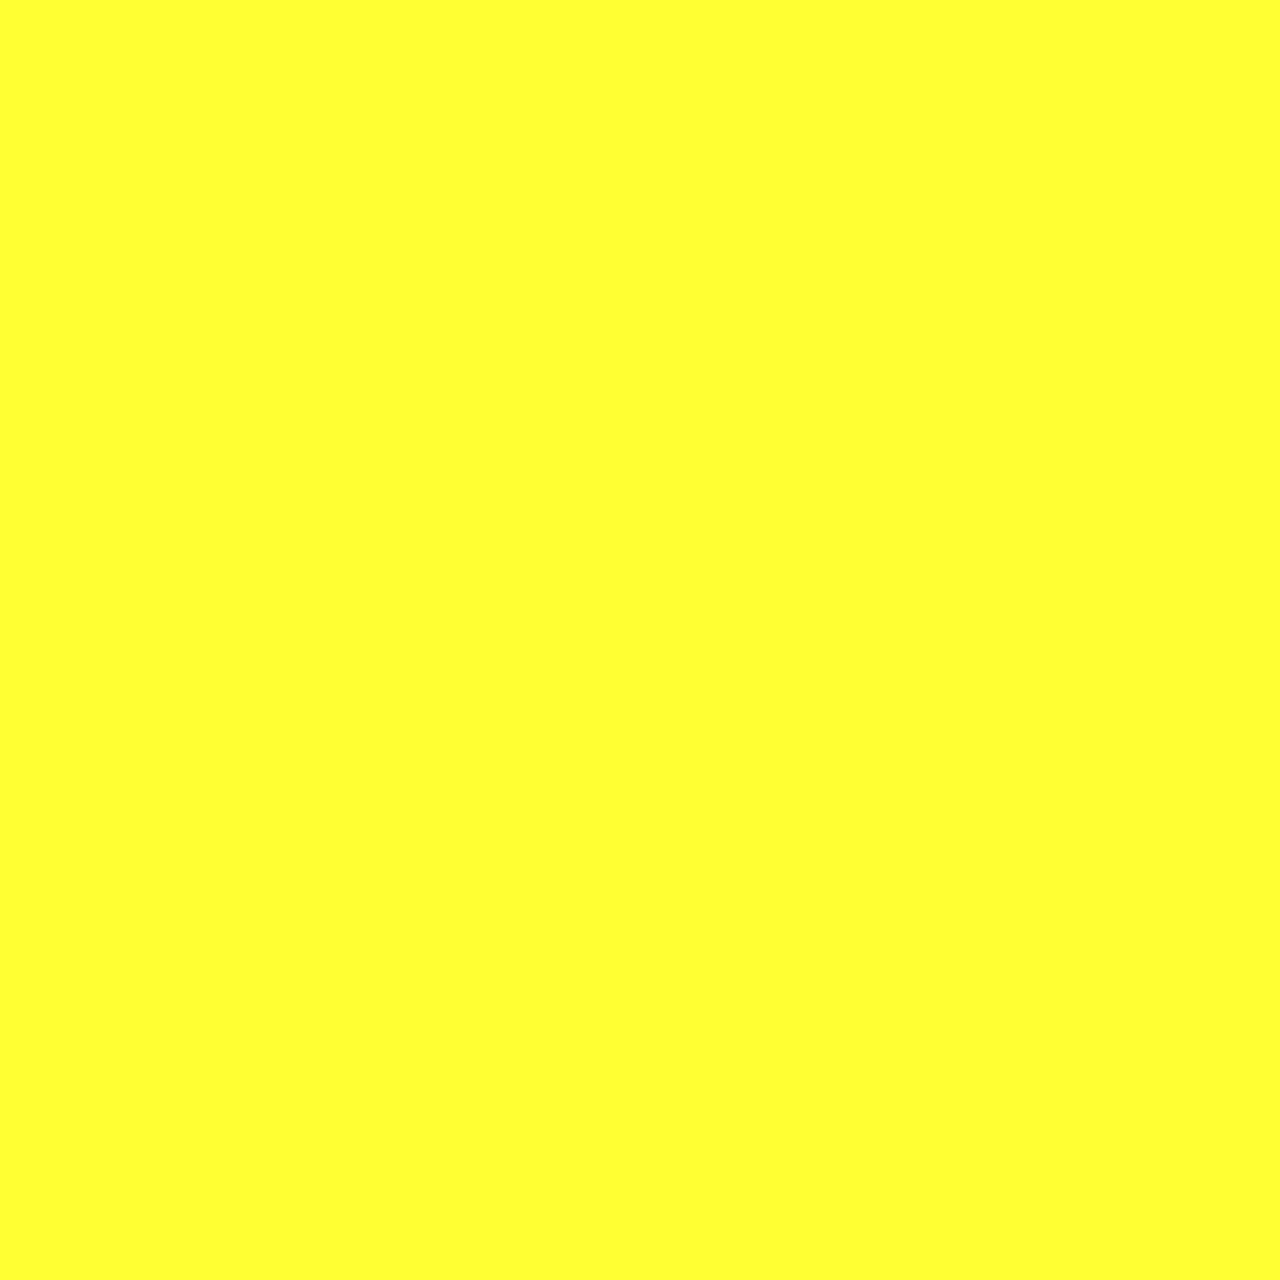 Yellow Lollies